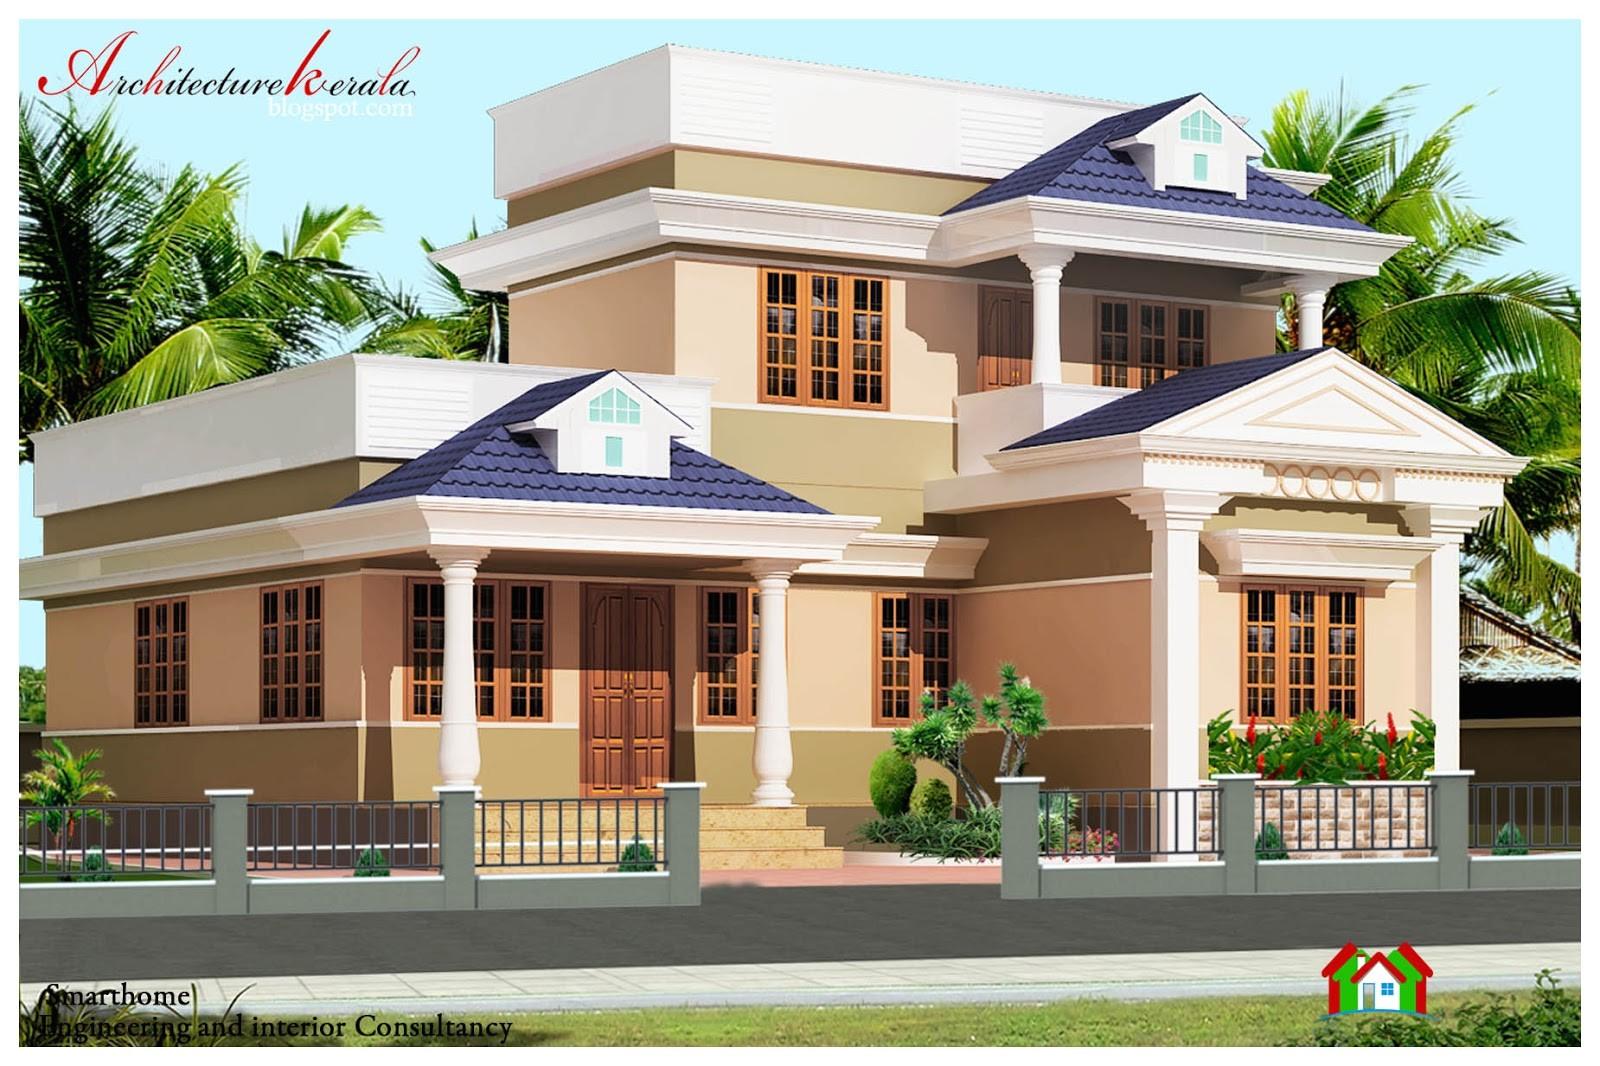 Kerala Style Home Plans Architecture Kerala 1000 Sq Ft Kerala Style House Plan